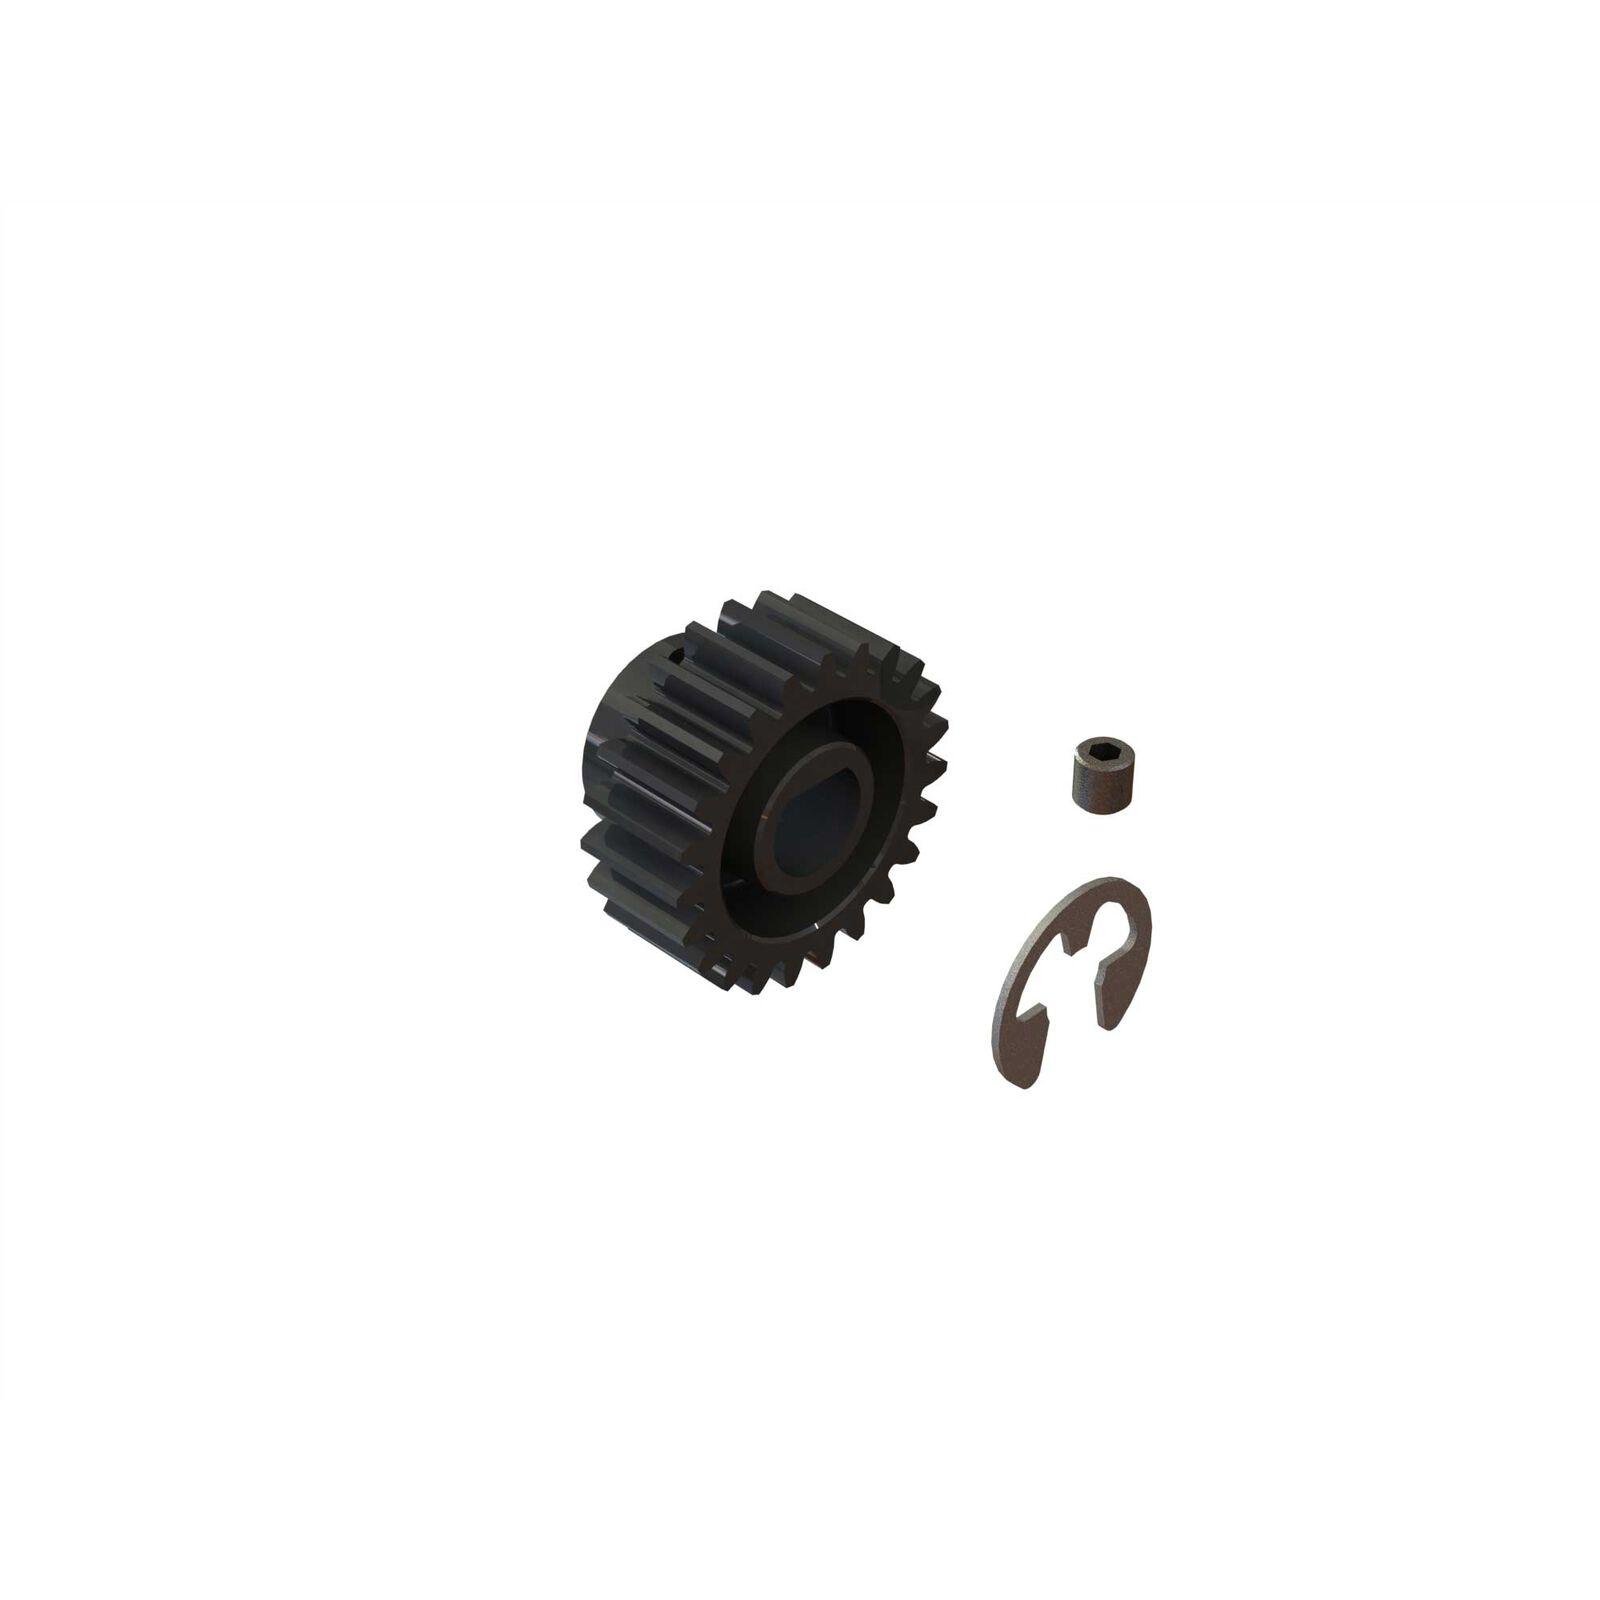 23T Mod1 Safe-D8 Pinion Gear